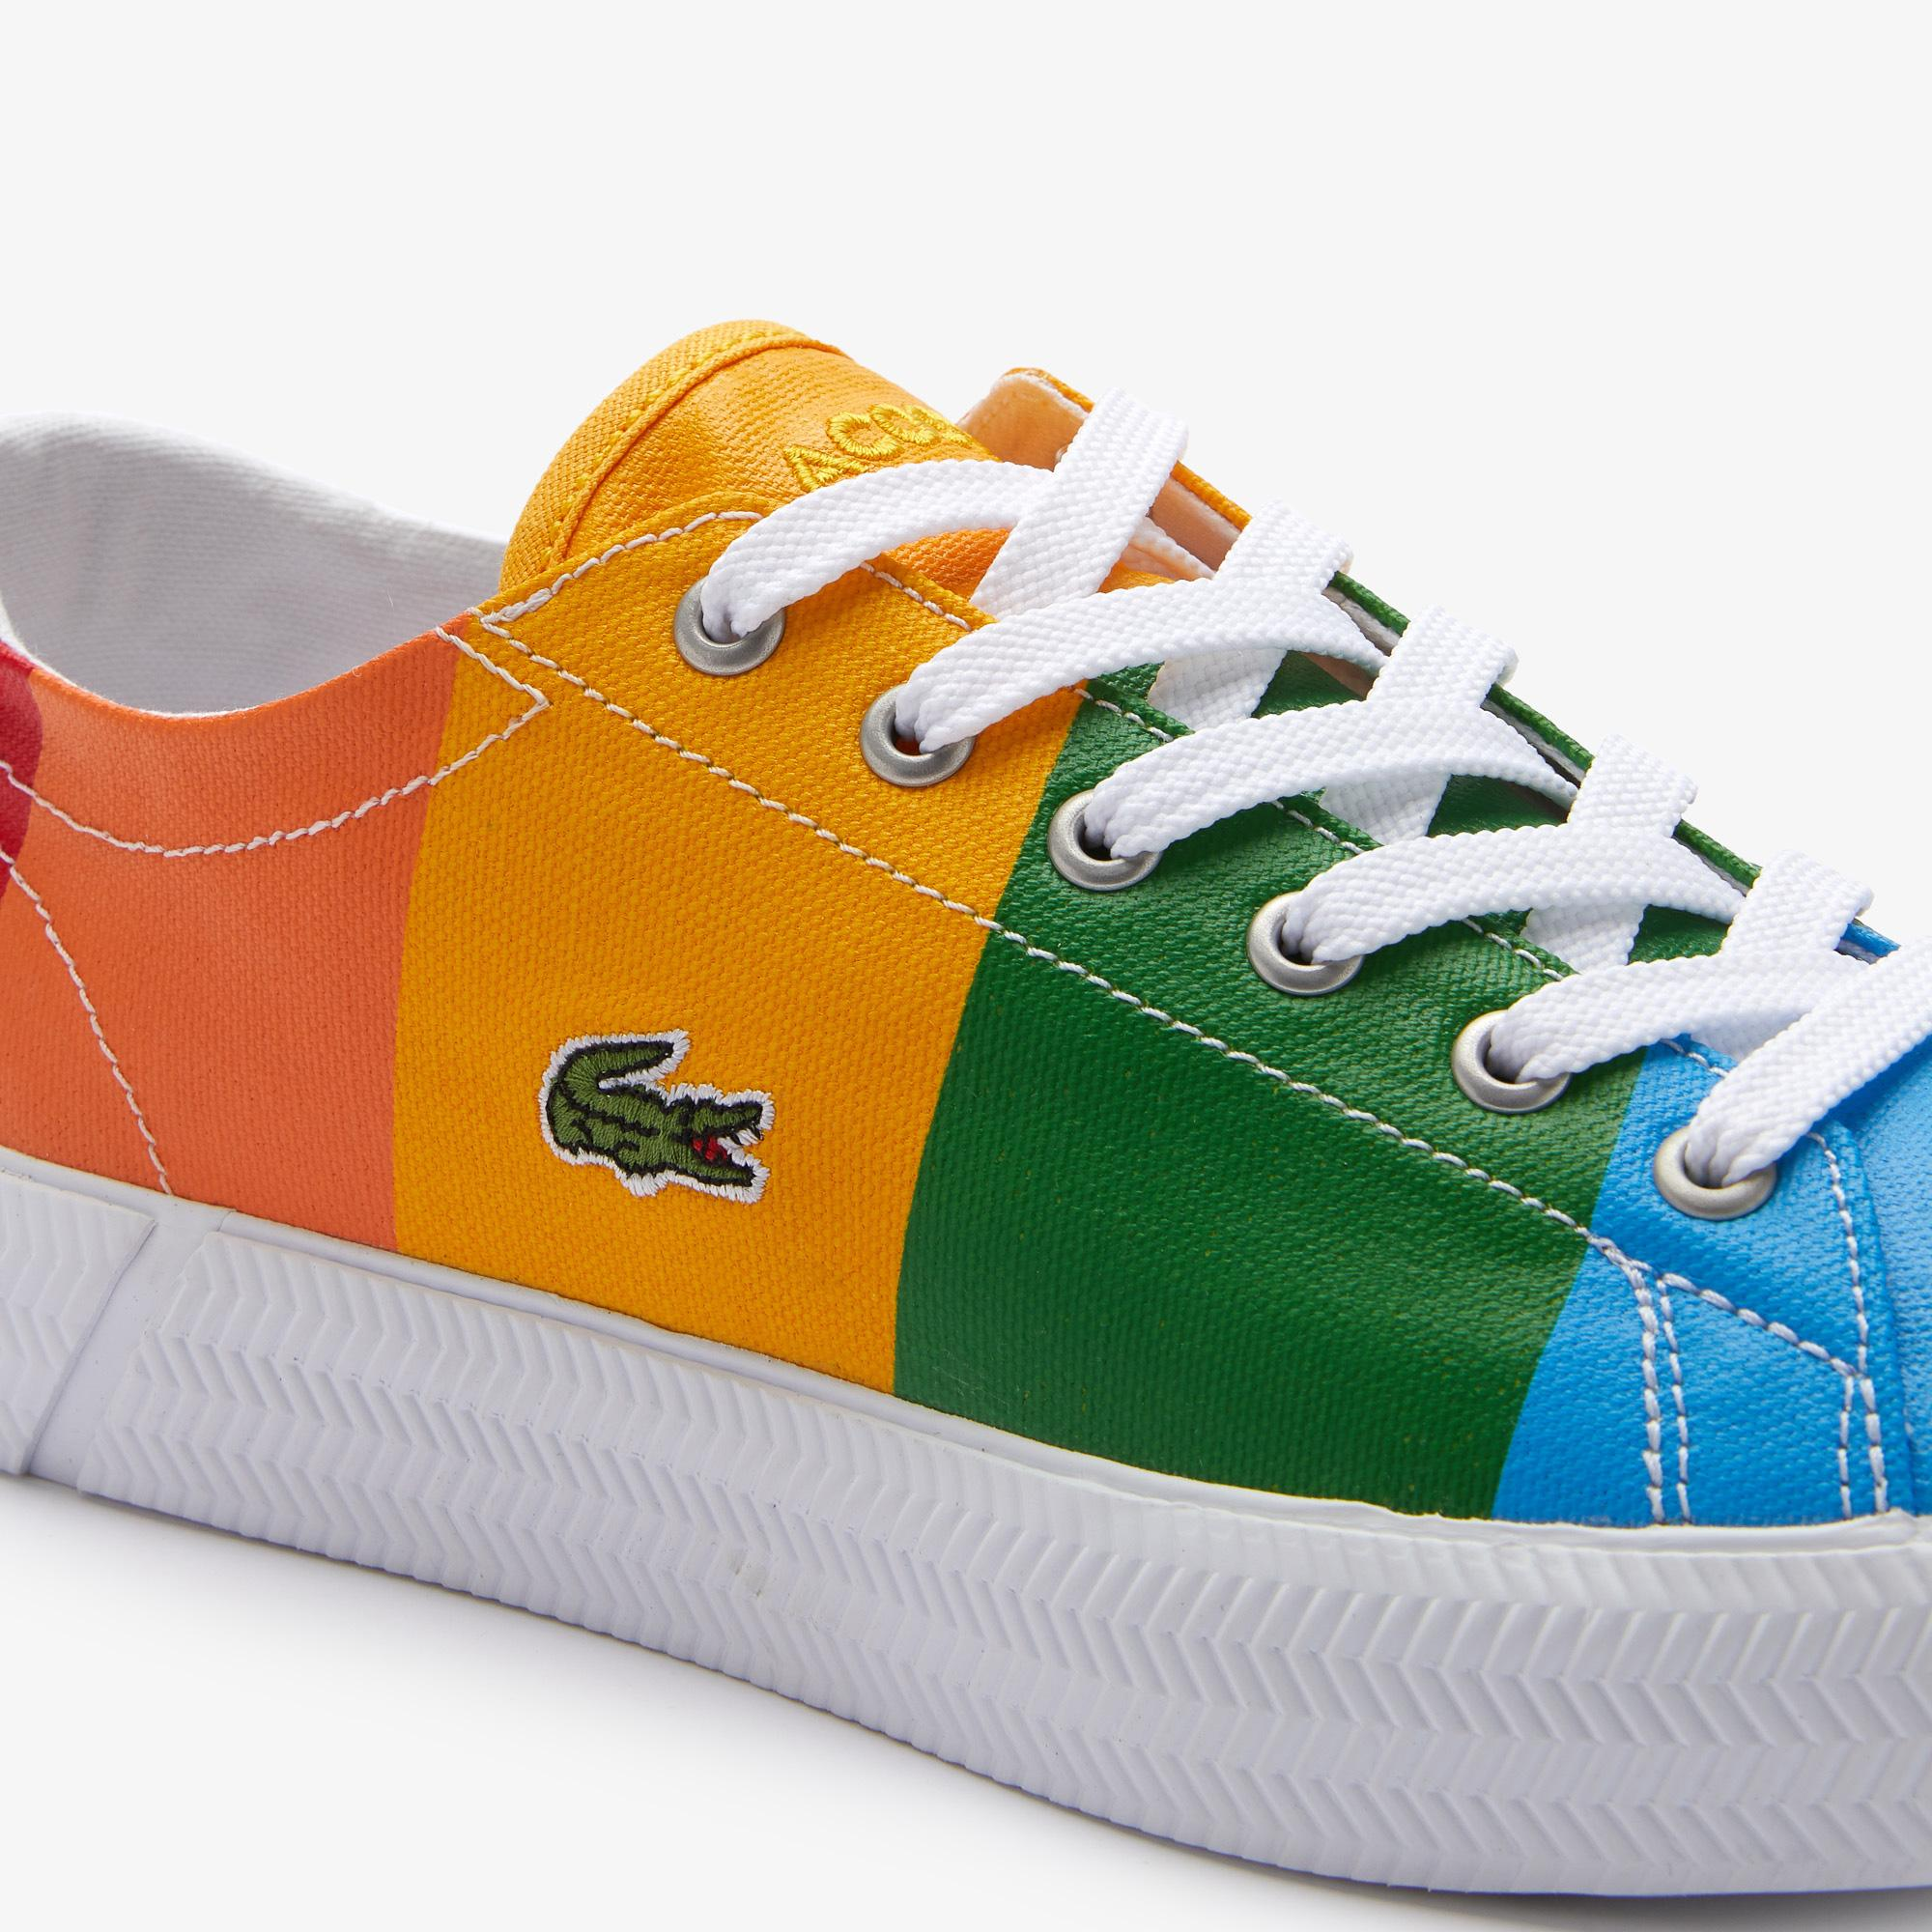 Lacoste Gripshot Paloroid Kadın Renkli Sneaker